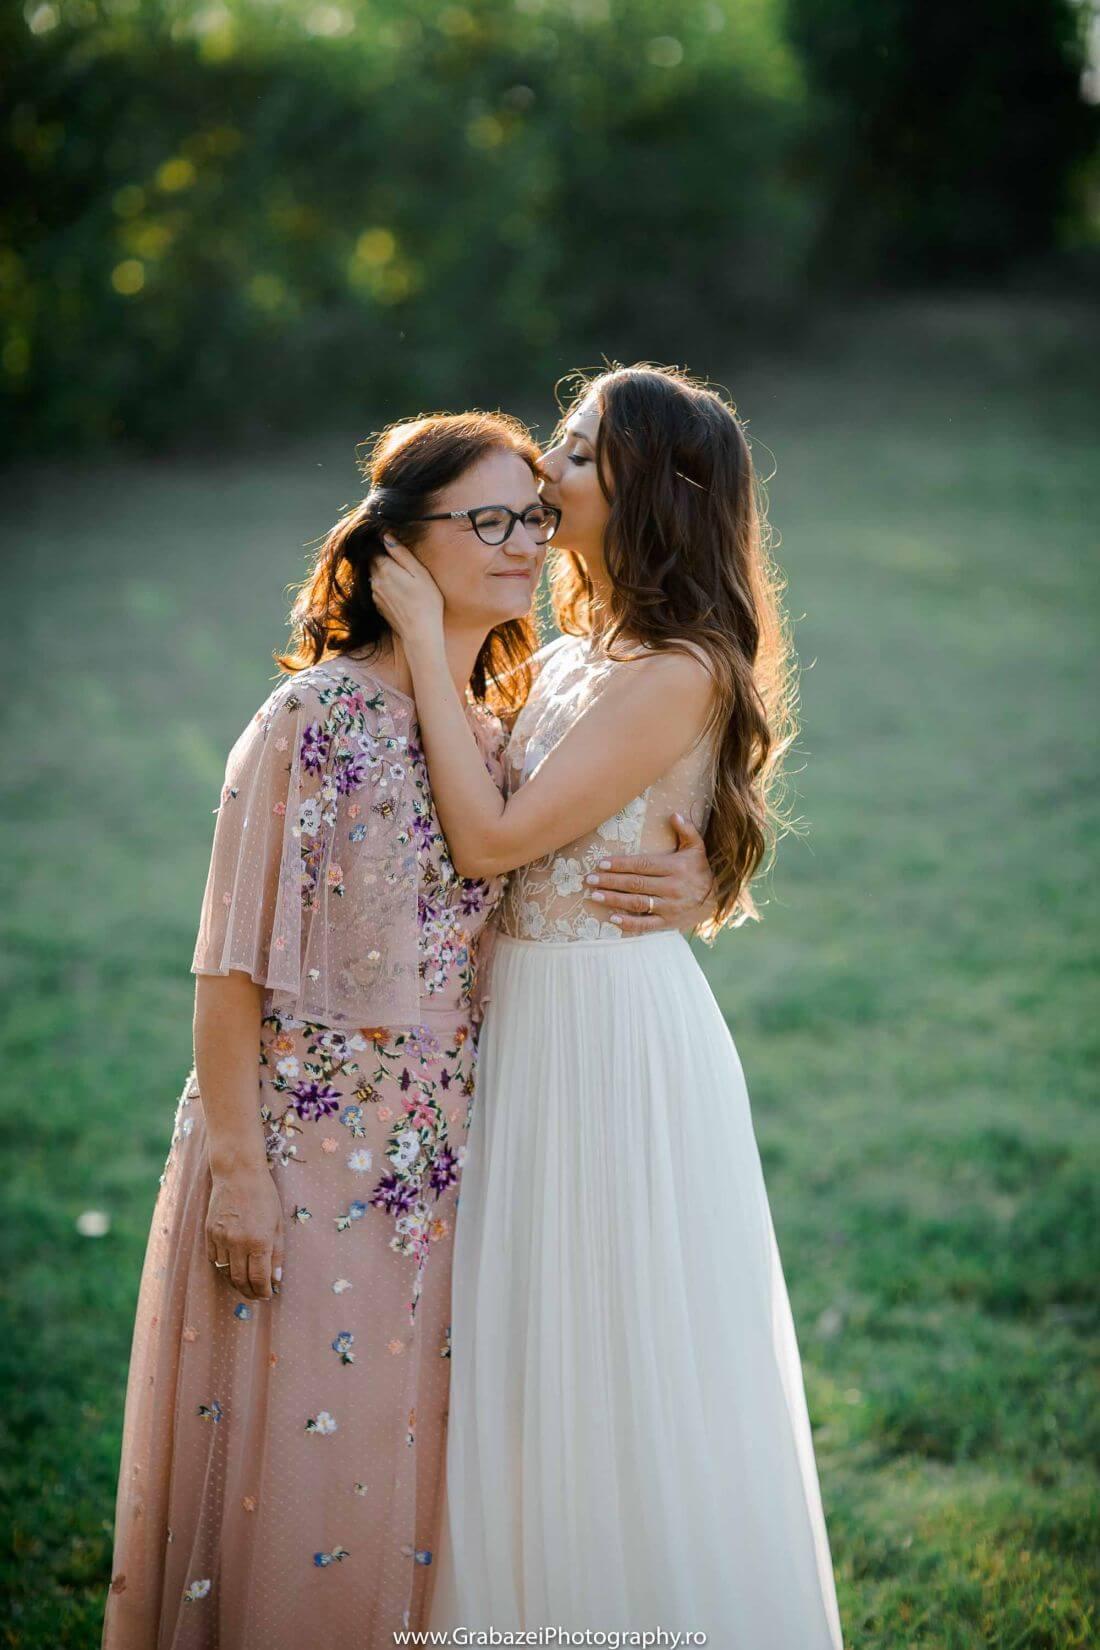 Nunta cu bumbac – Cristina si Sergiu – IDO-Weddings-nuntiinaerliber (18)